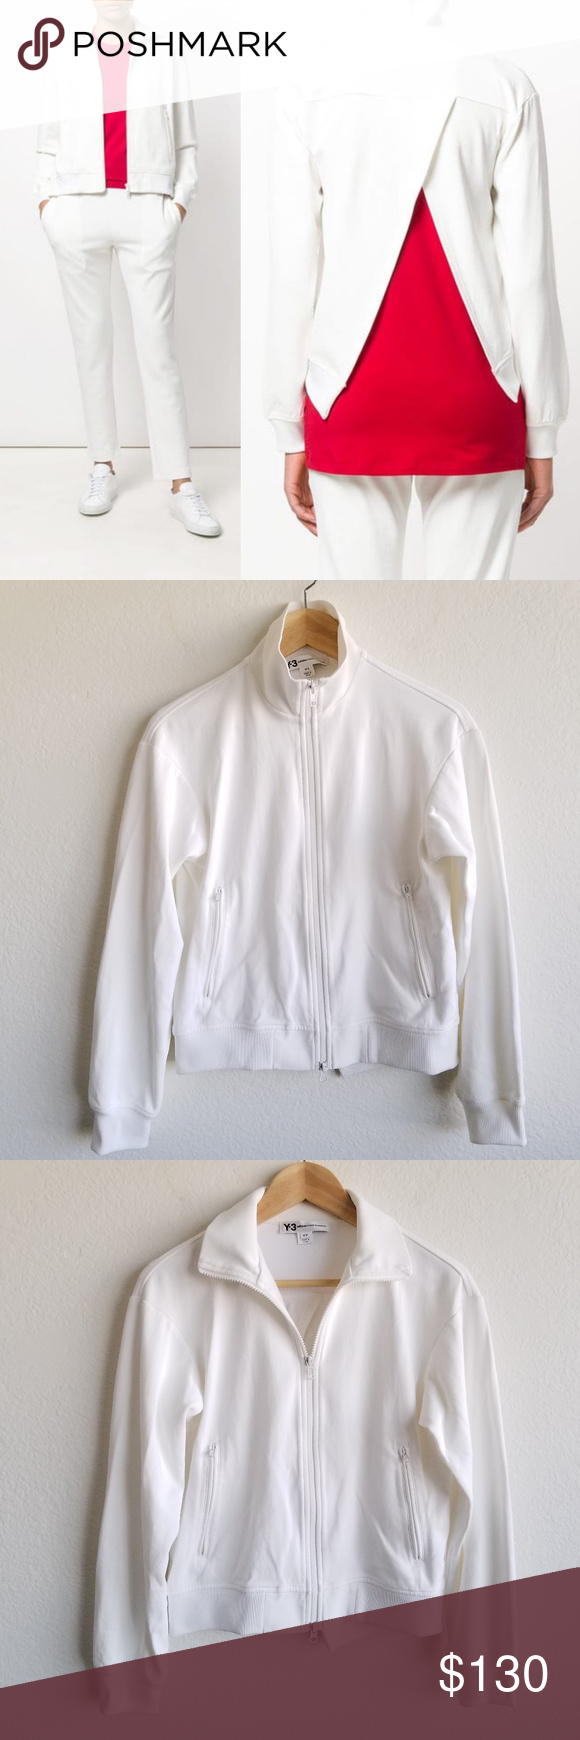 Y 3 Adidas Open Back Zipped Jacket Yohji Yamamoto Yohji Yamamoto Yamamoto Jackets